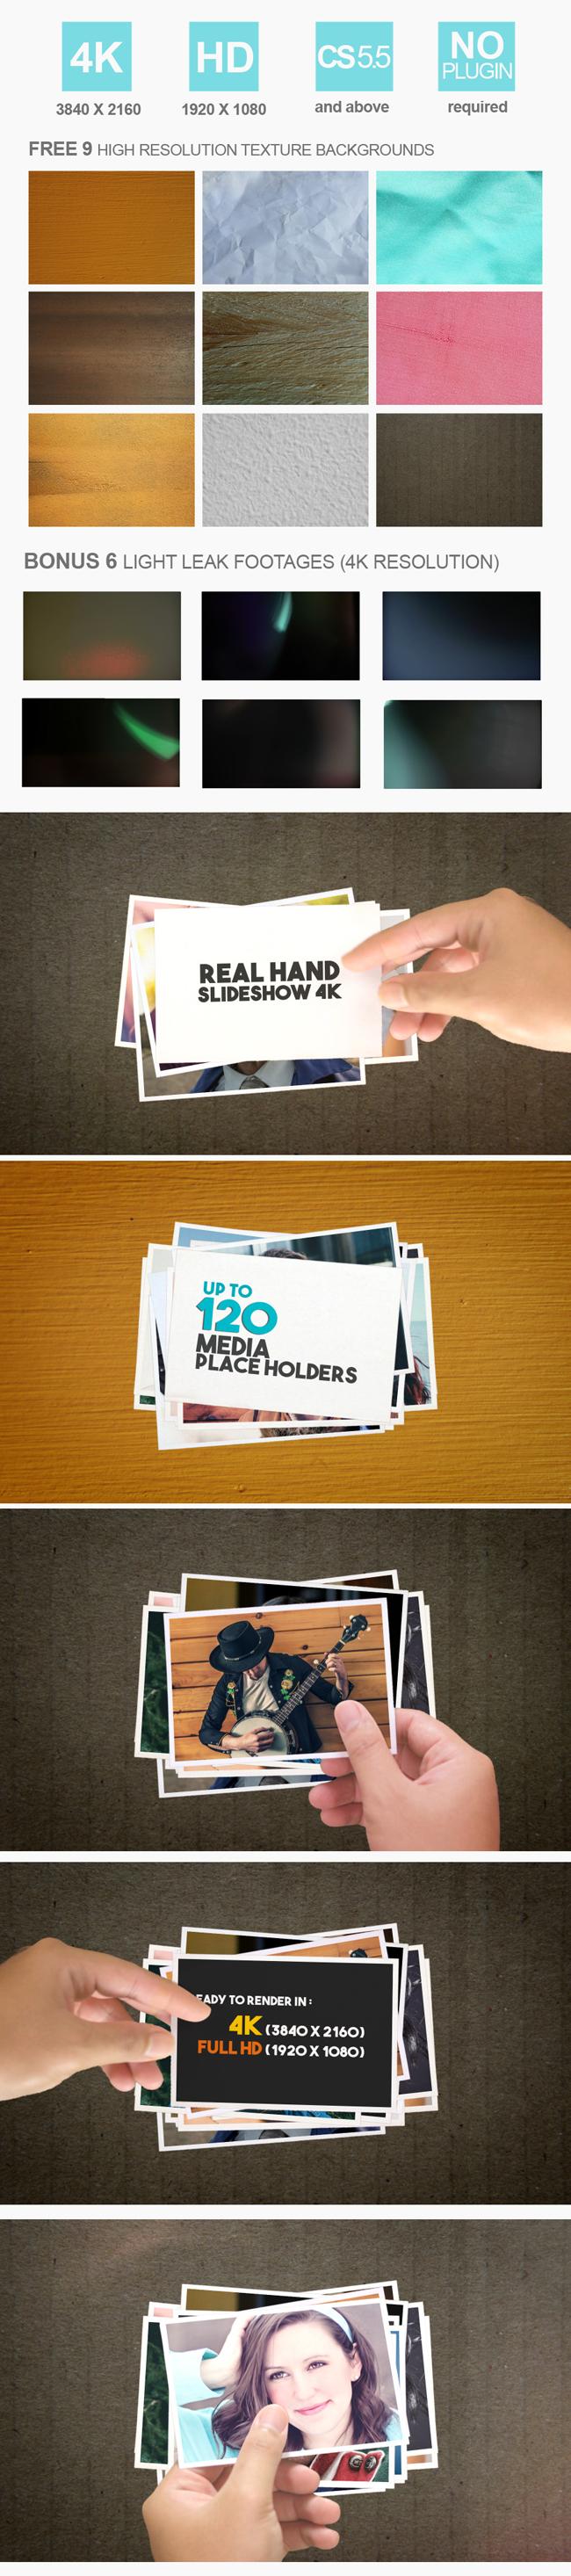 Real Hand Slideshow 4K - 1